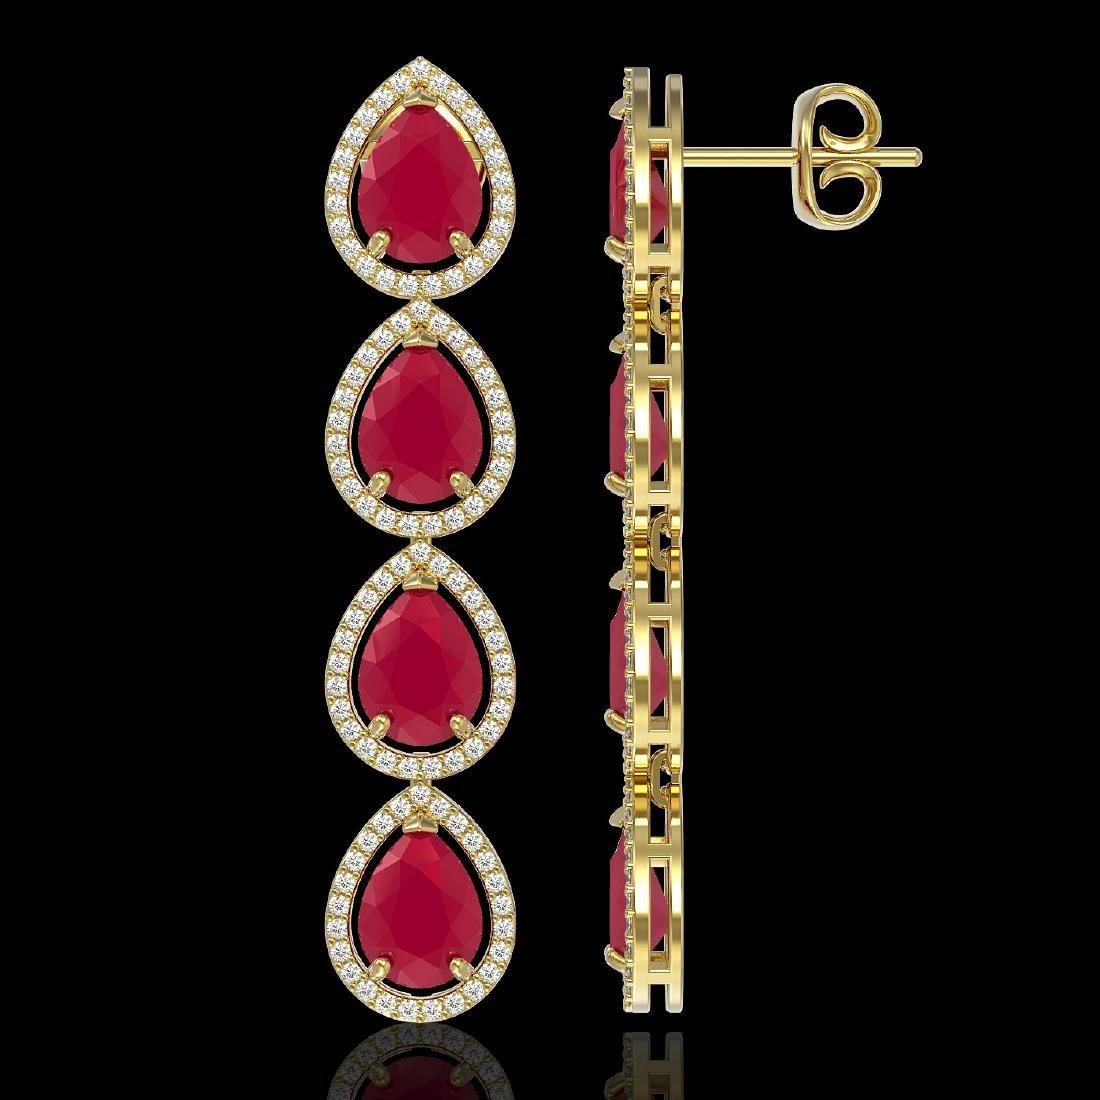 16.01 CTW Ruby & Diamond Halo Earrings 10K Yellow Gold - 2